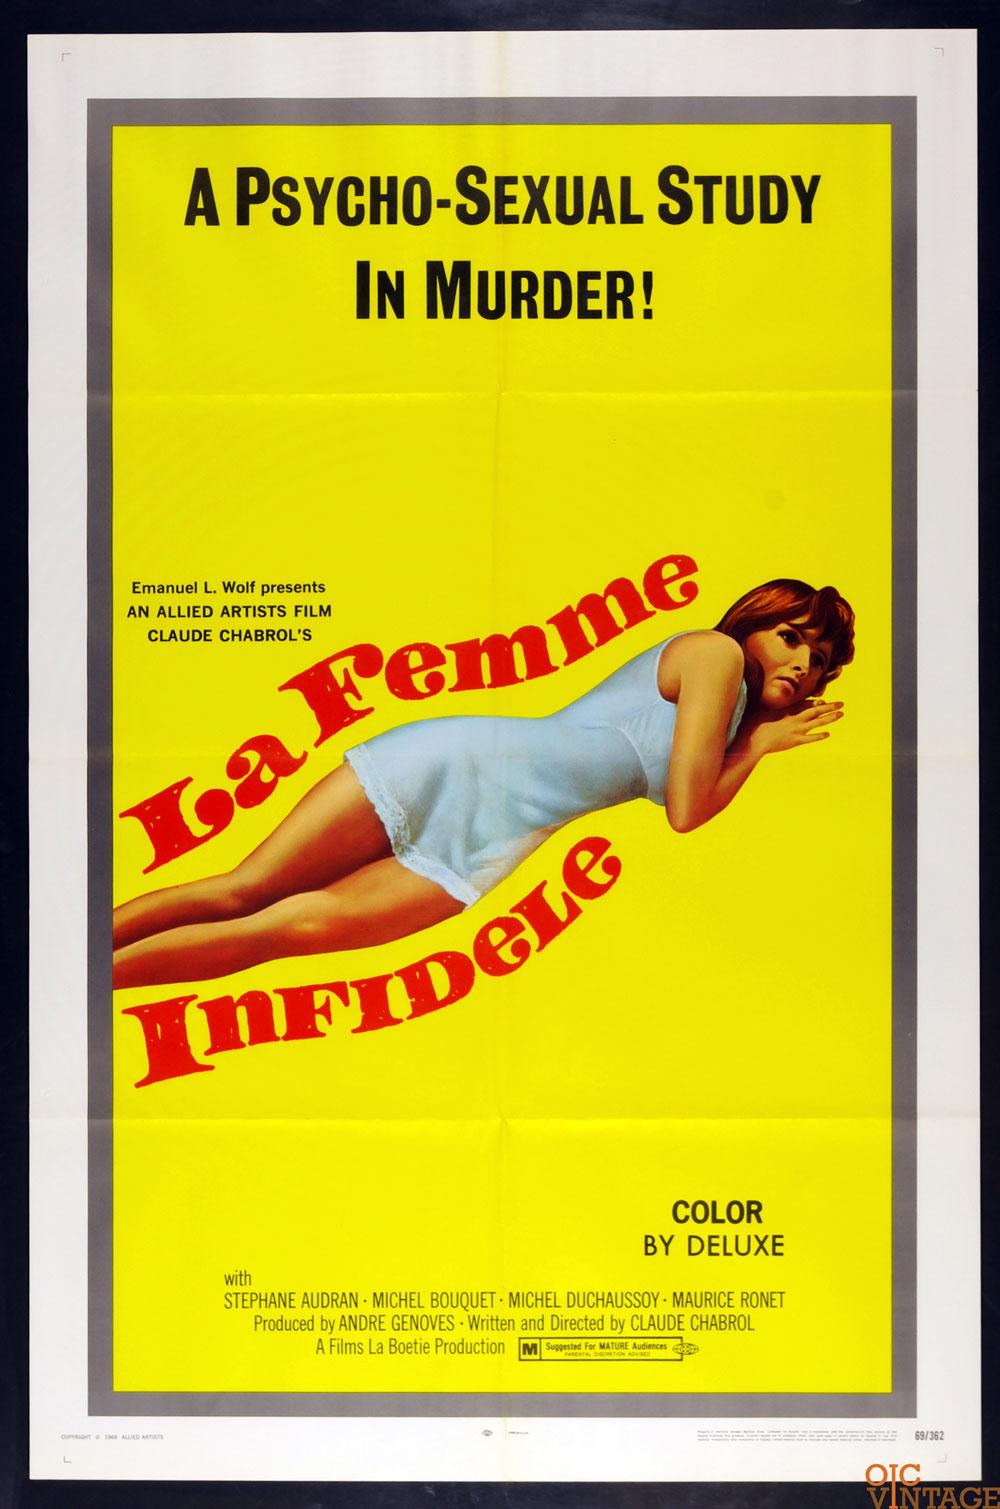 La Femme Infidele The Unfaithful Wife Movie Poster 1969 27 x 41